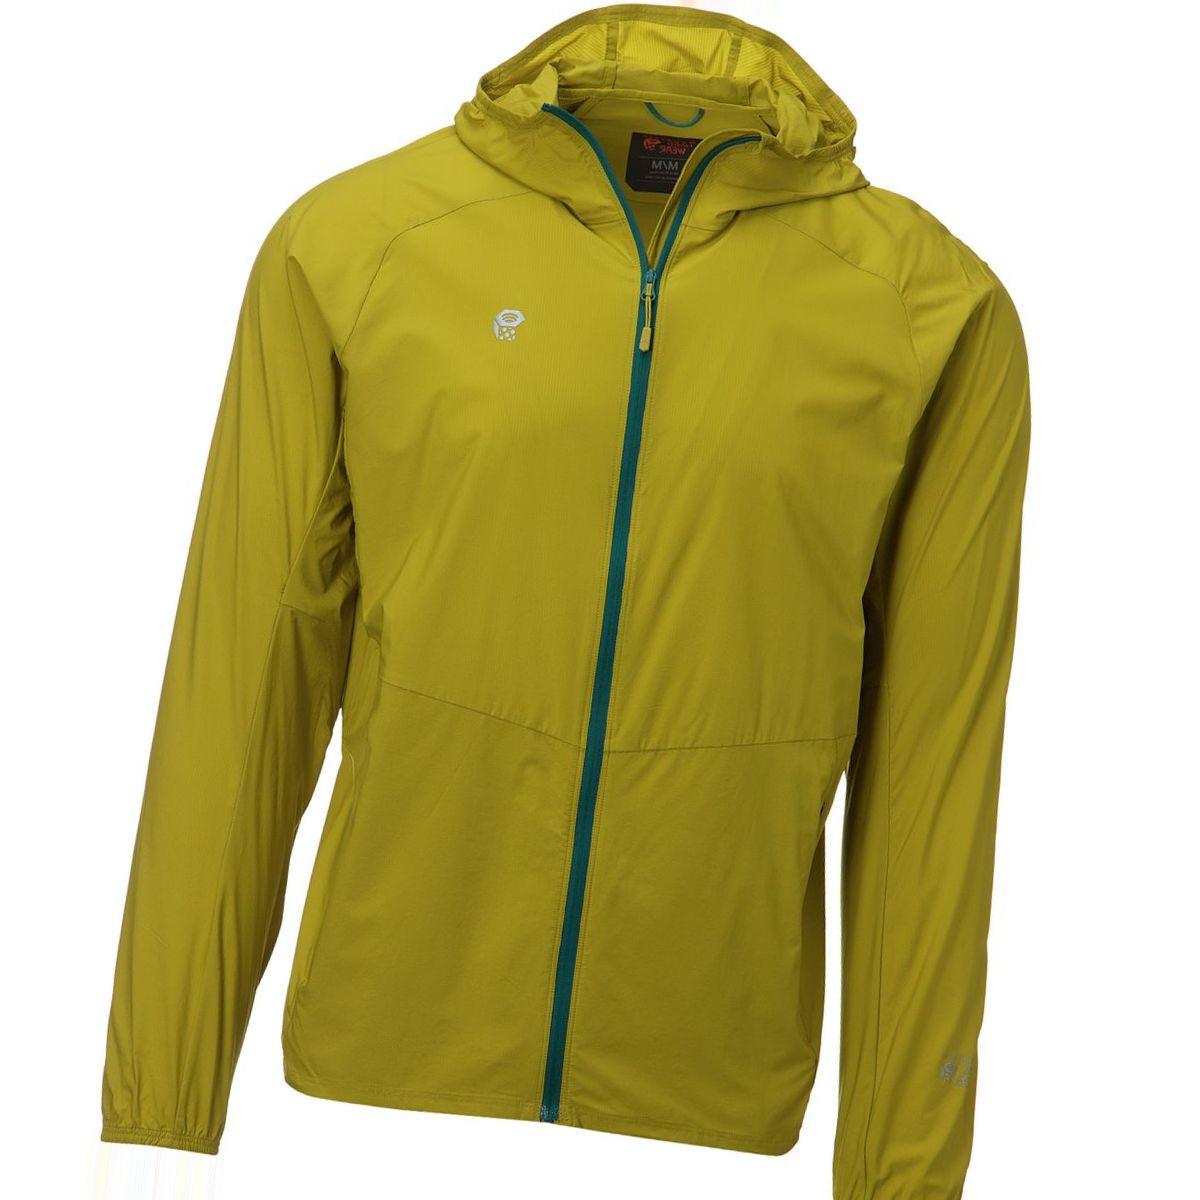 Mountain Hardwear Kor Preshell Hooded Jacket - Men's